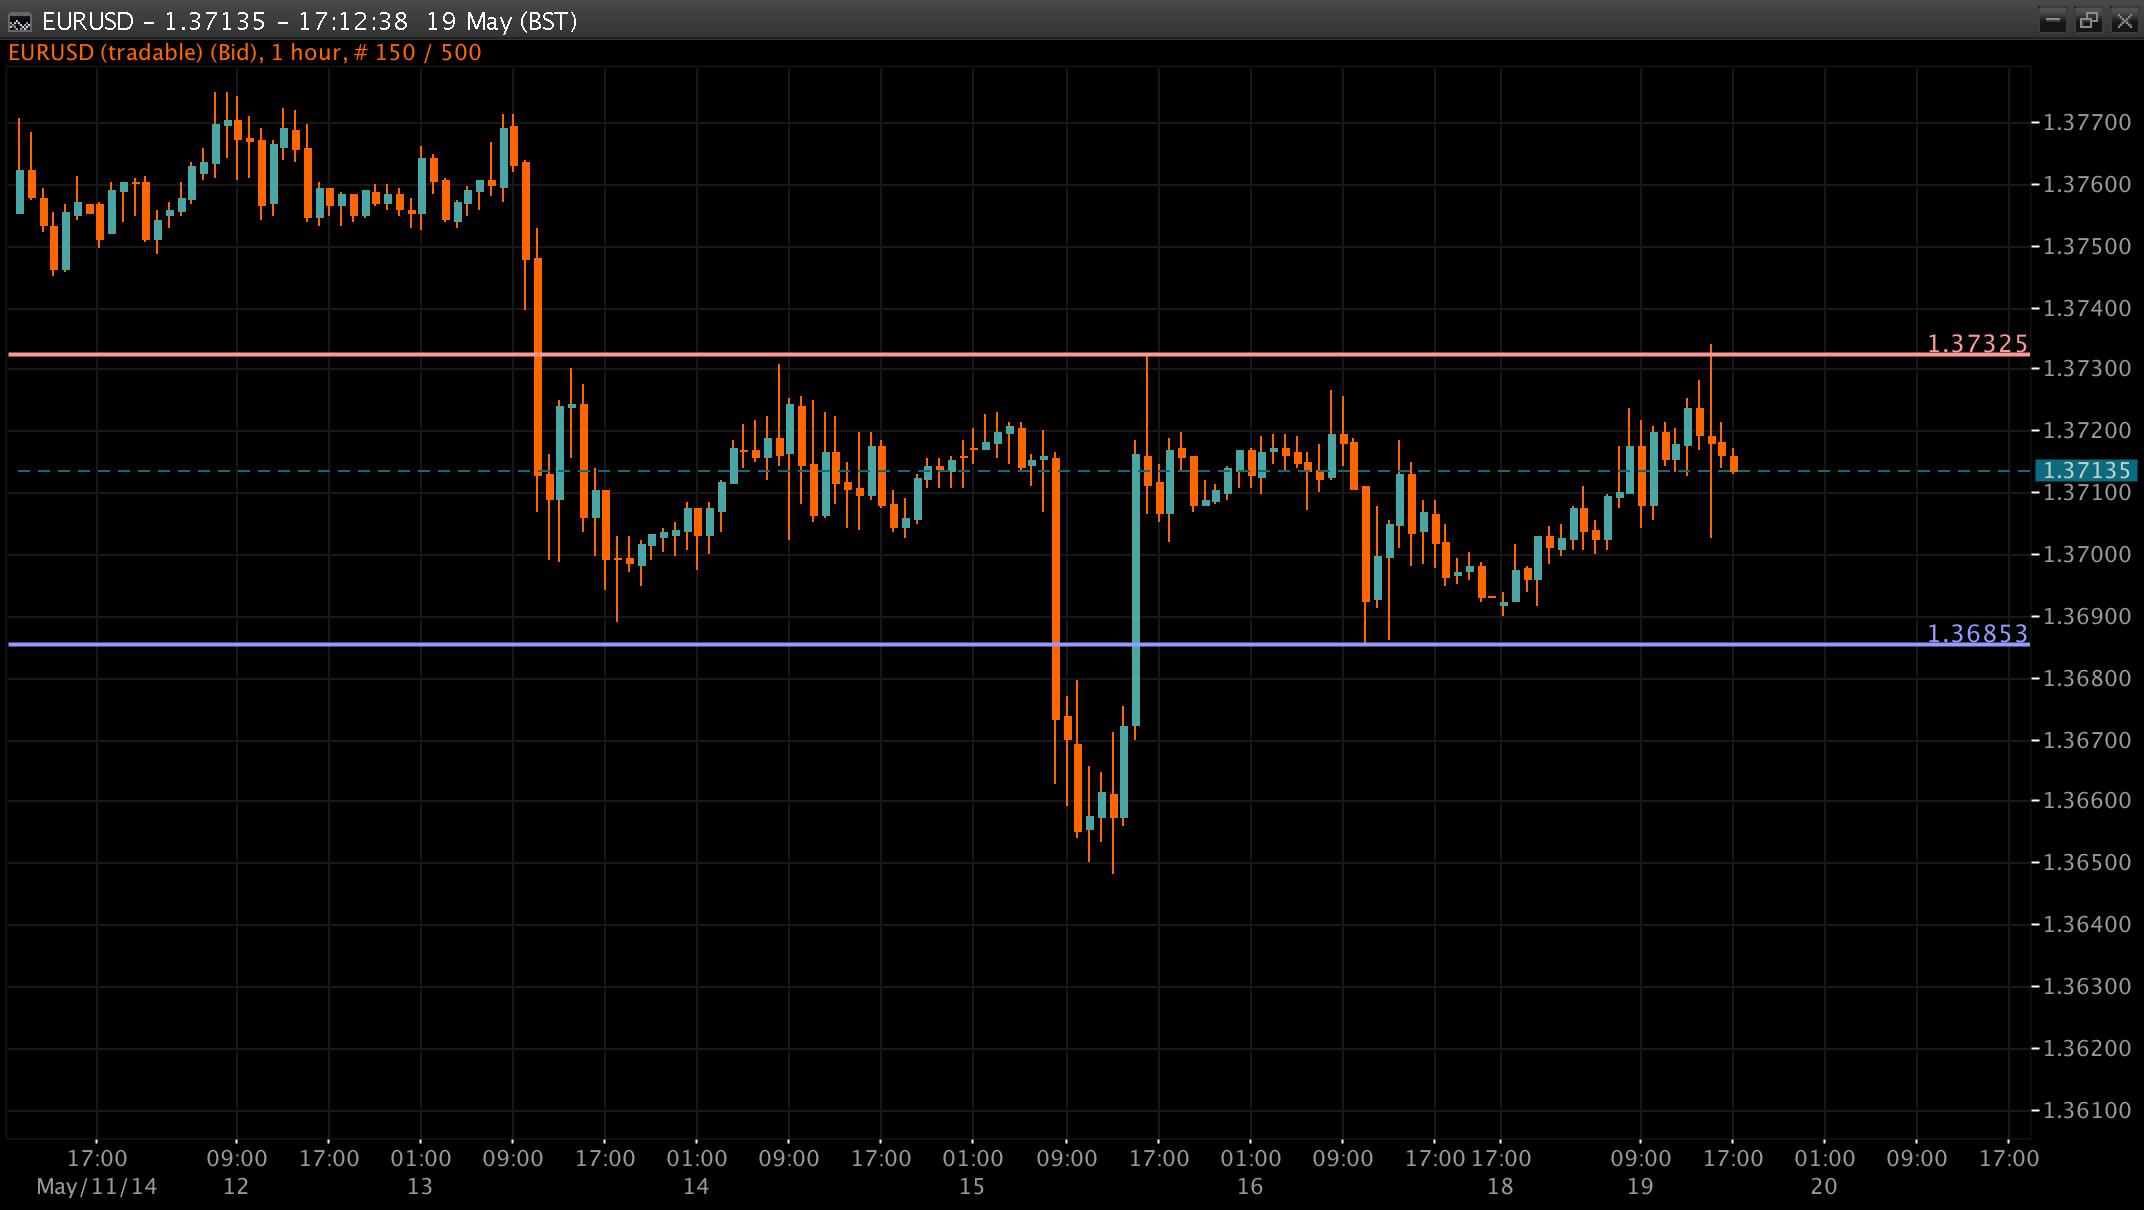 EUR/USD Chart 19 May 2014